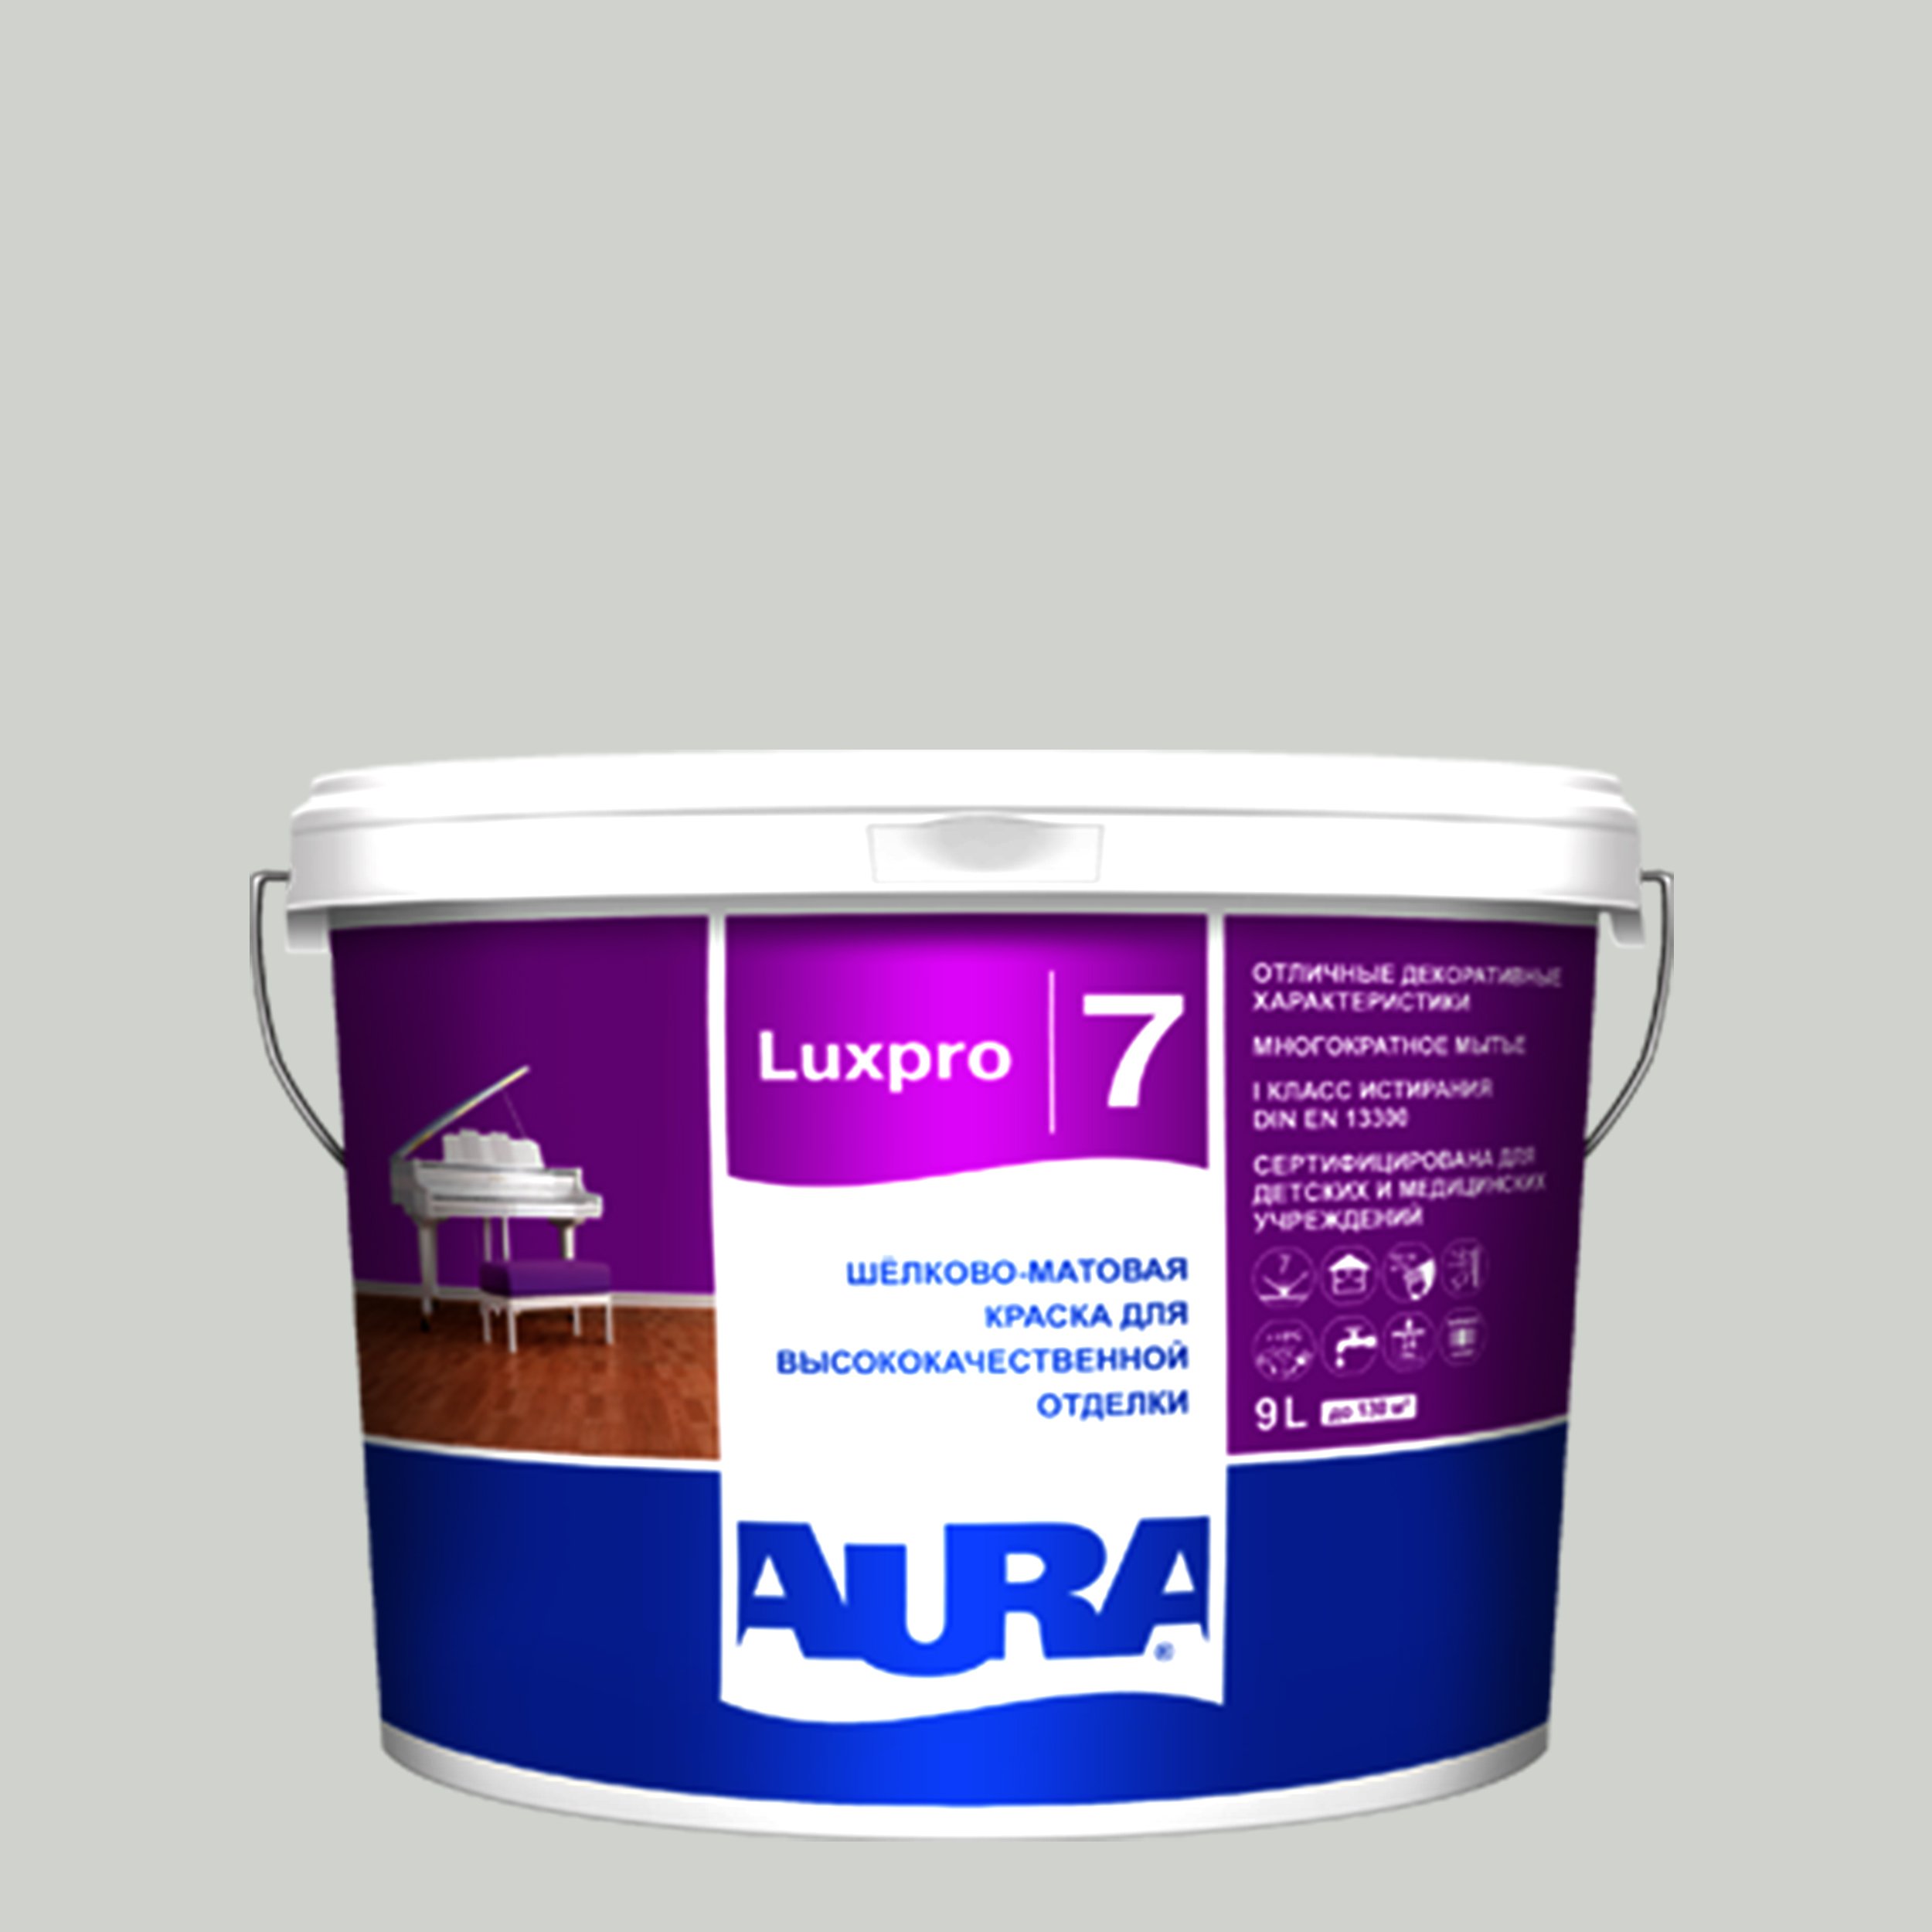 Фото 5 - Краска интерьерная, Aura LuxPRO 7, RAL 4008, 11 кг.